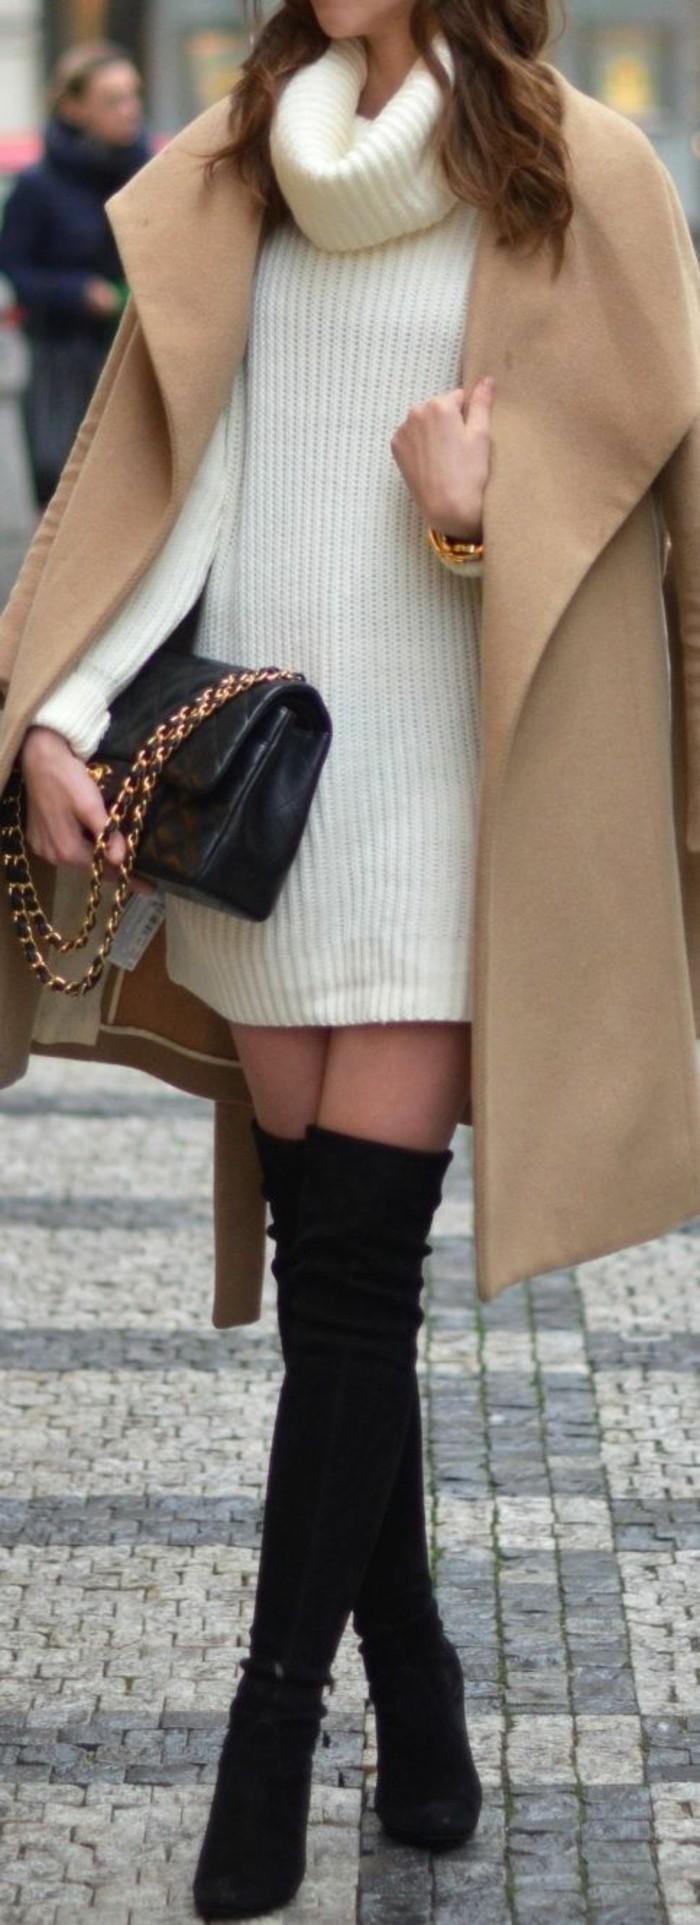 robe-pull-col-roule-elegante-bottes-cavalieres-manteau-camel